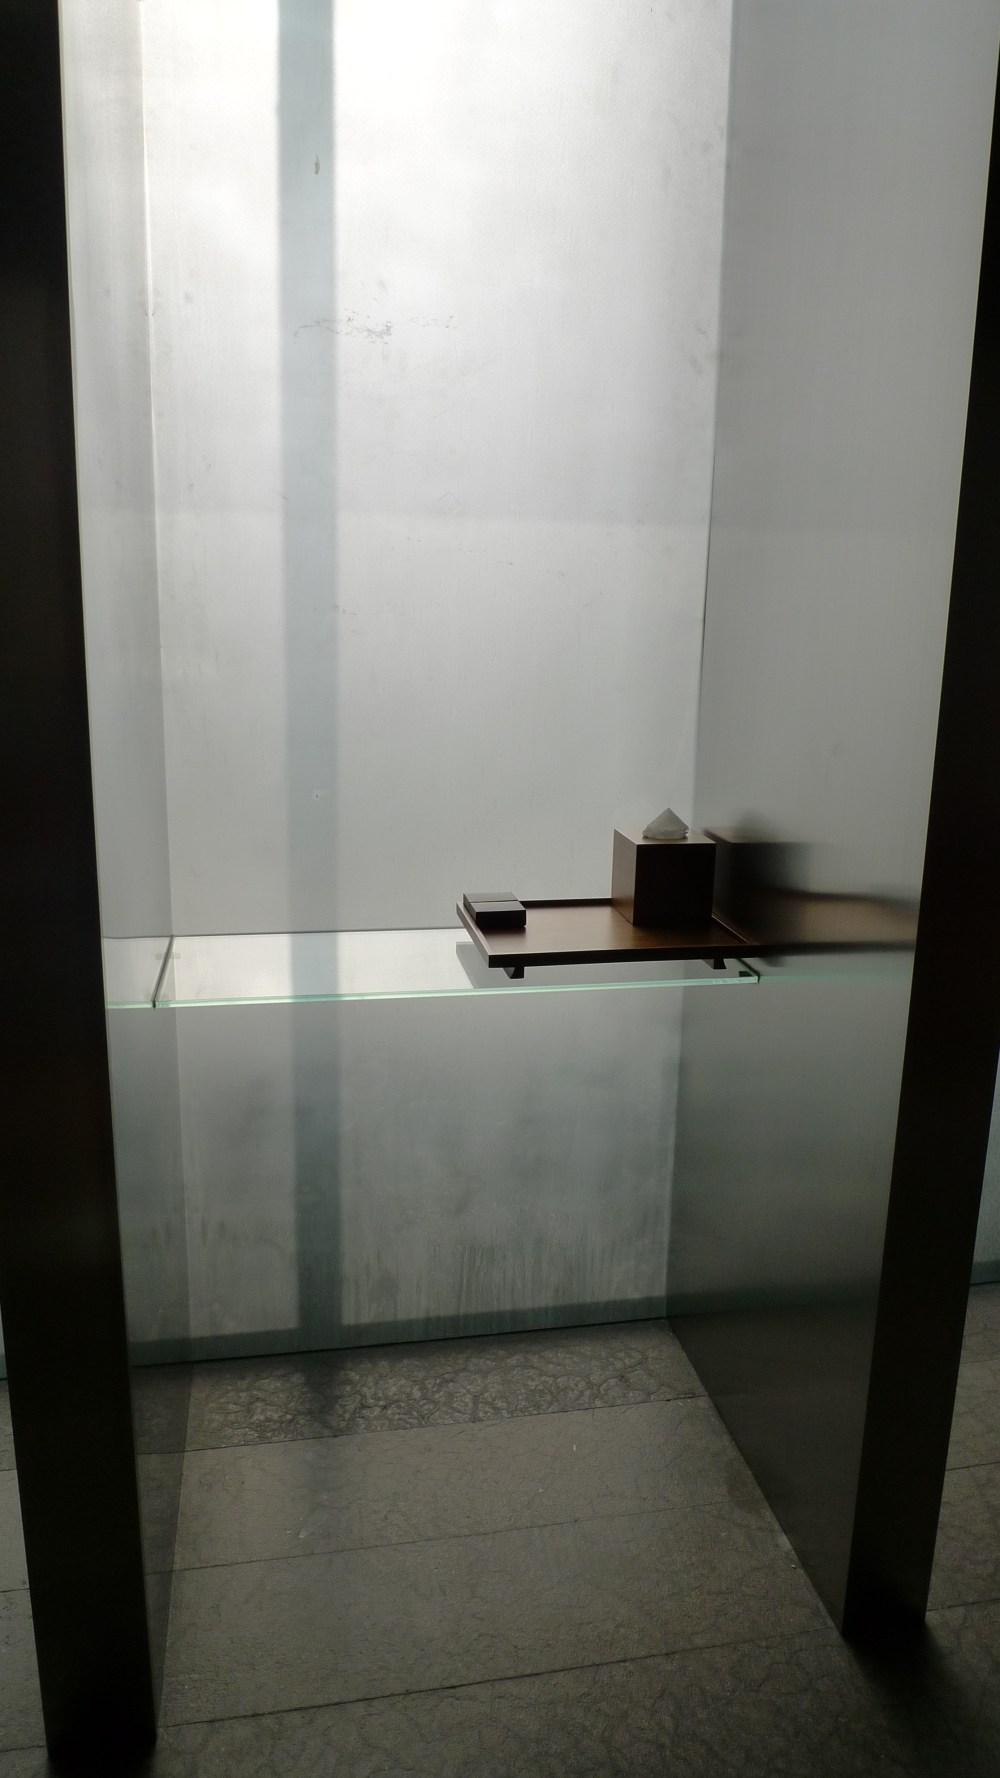 SHOW==北京亮酒吧==_P1010490.JPG